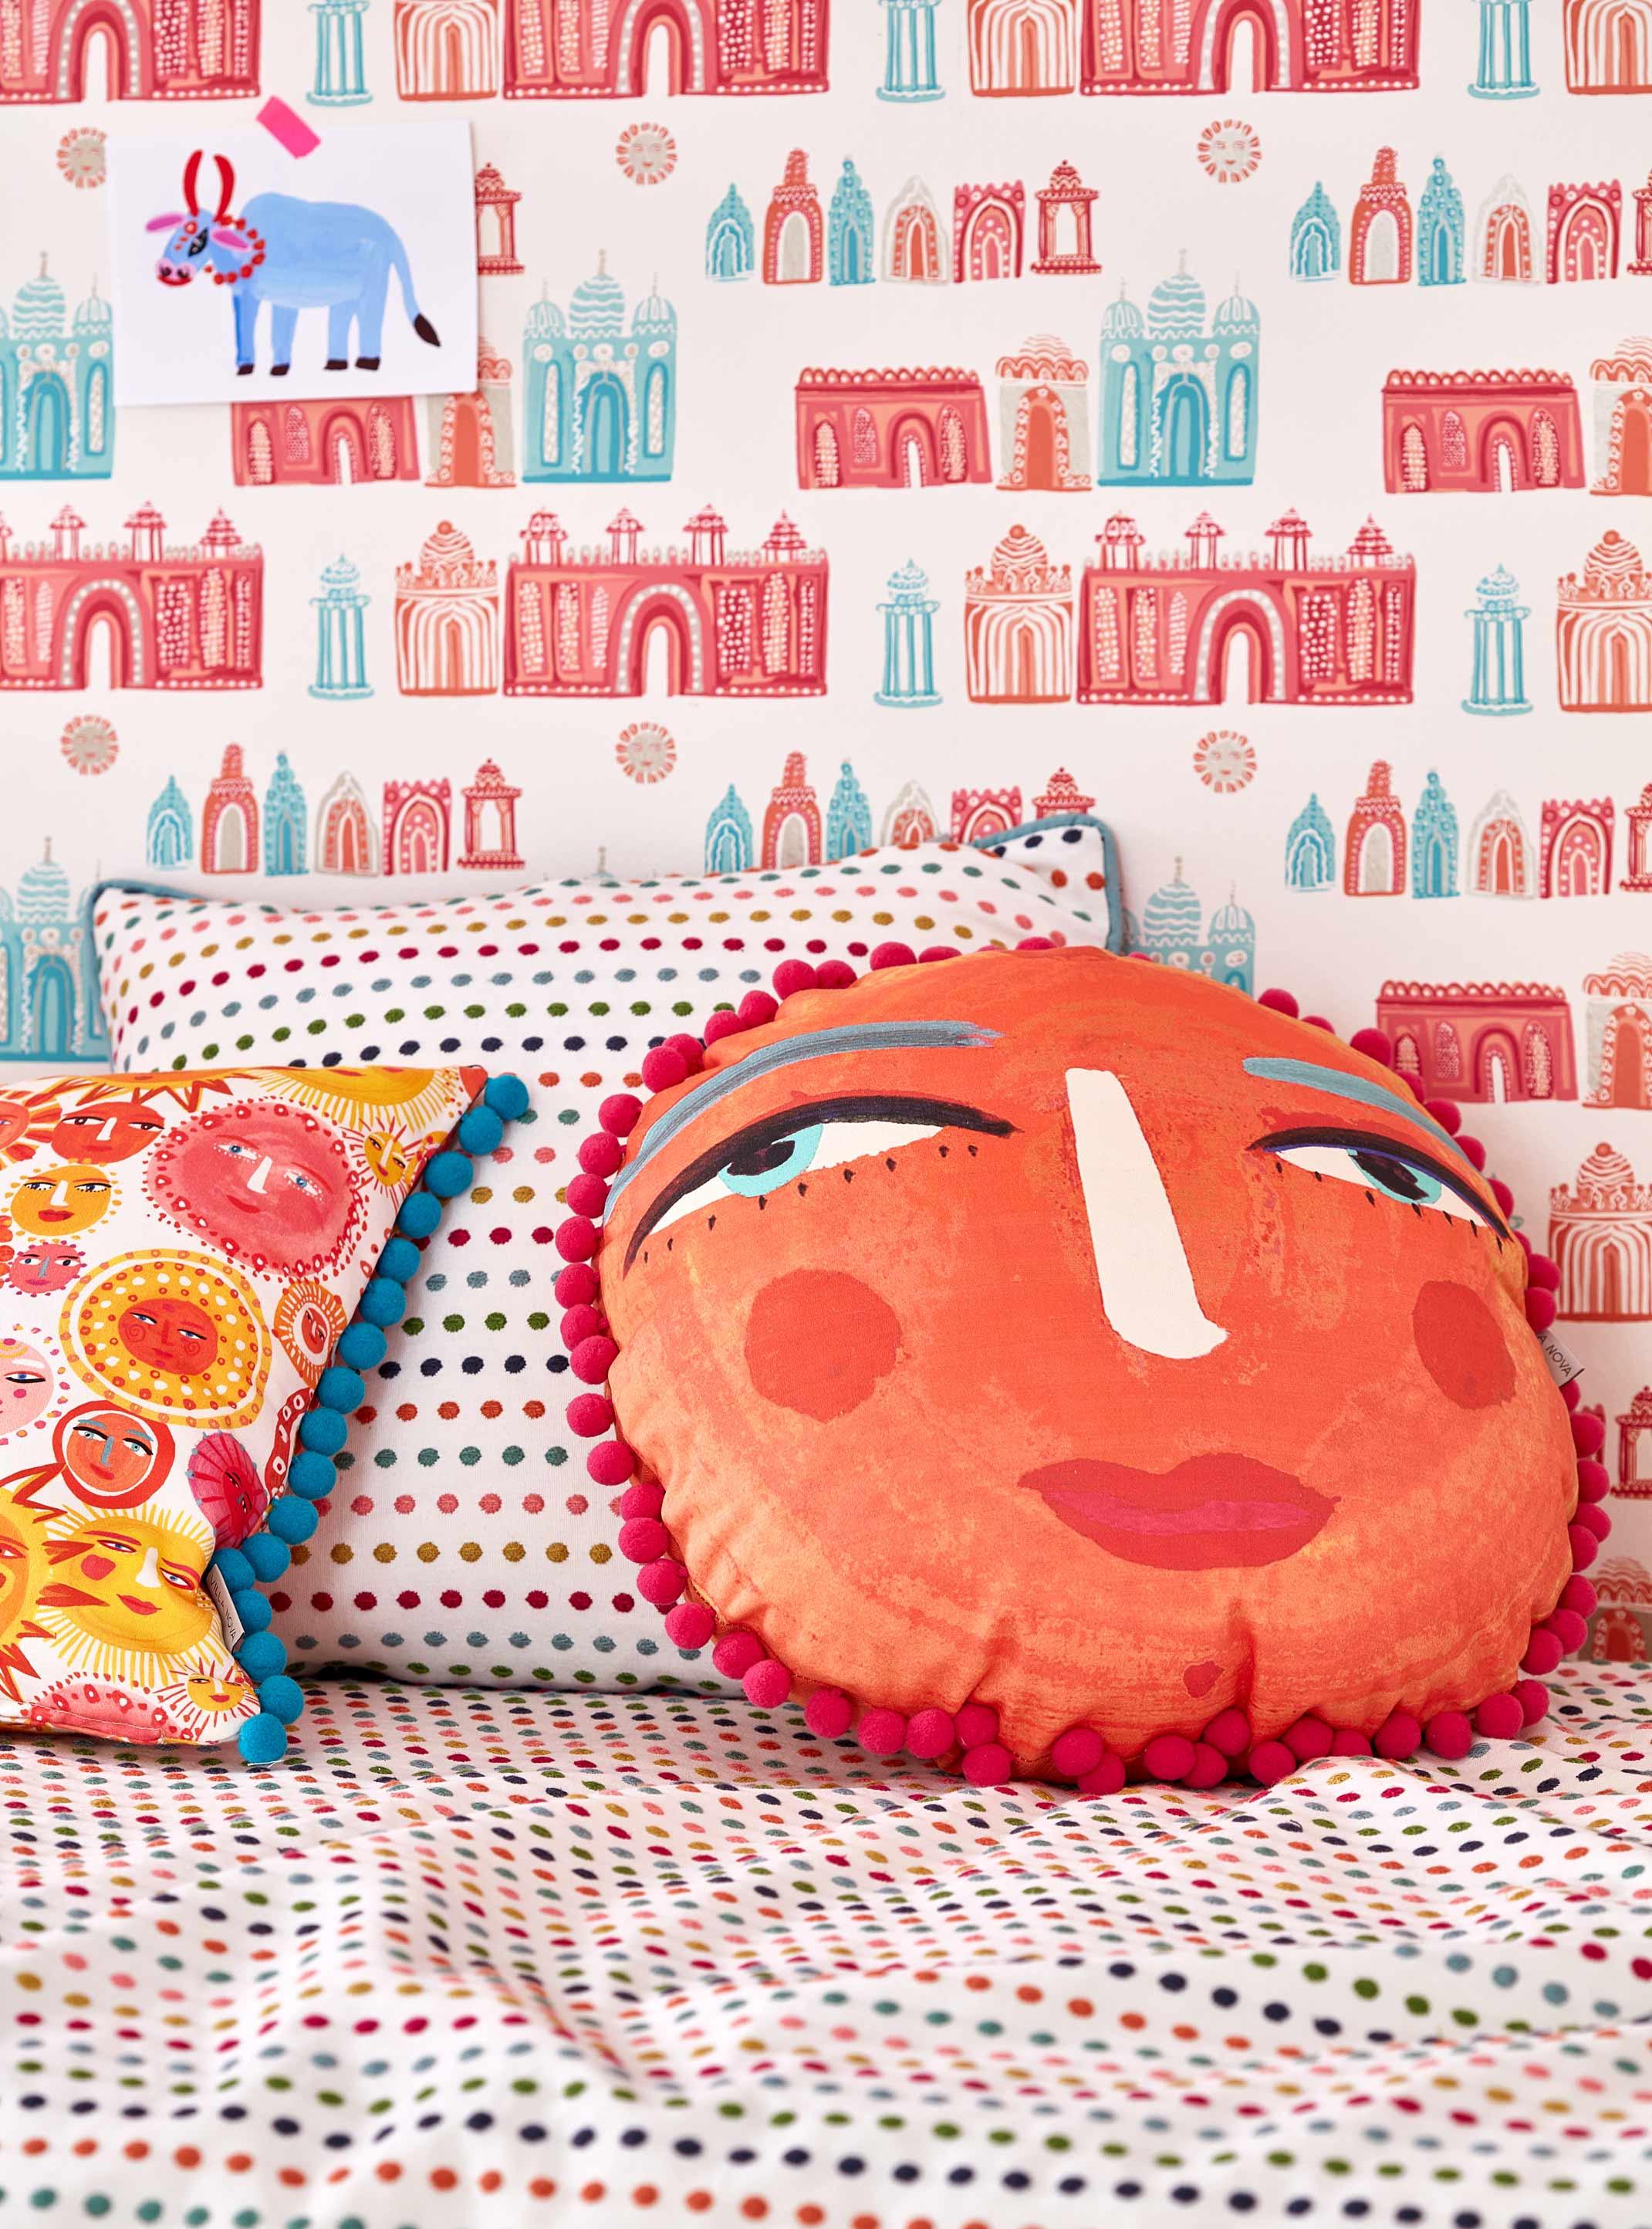 Corr---India---Cushion-1-004.jpg